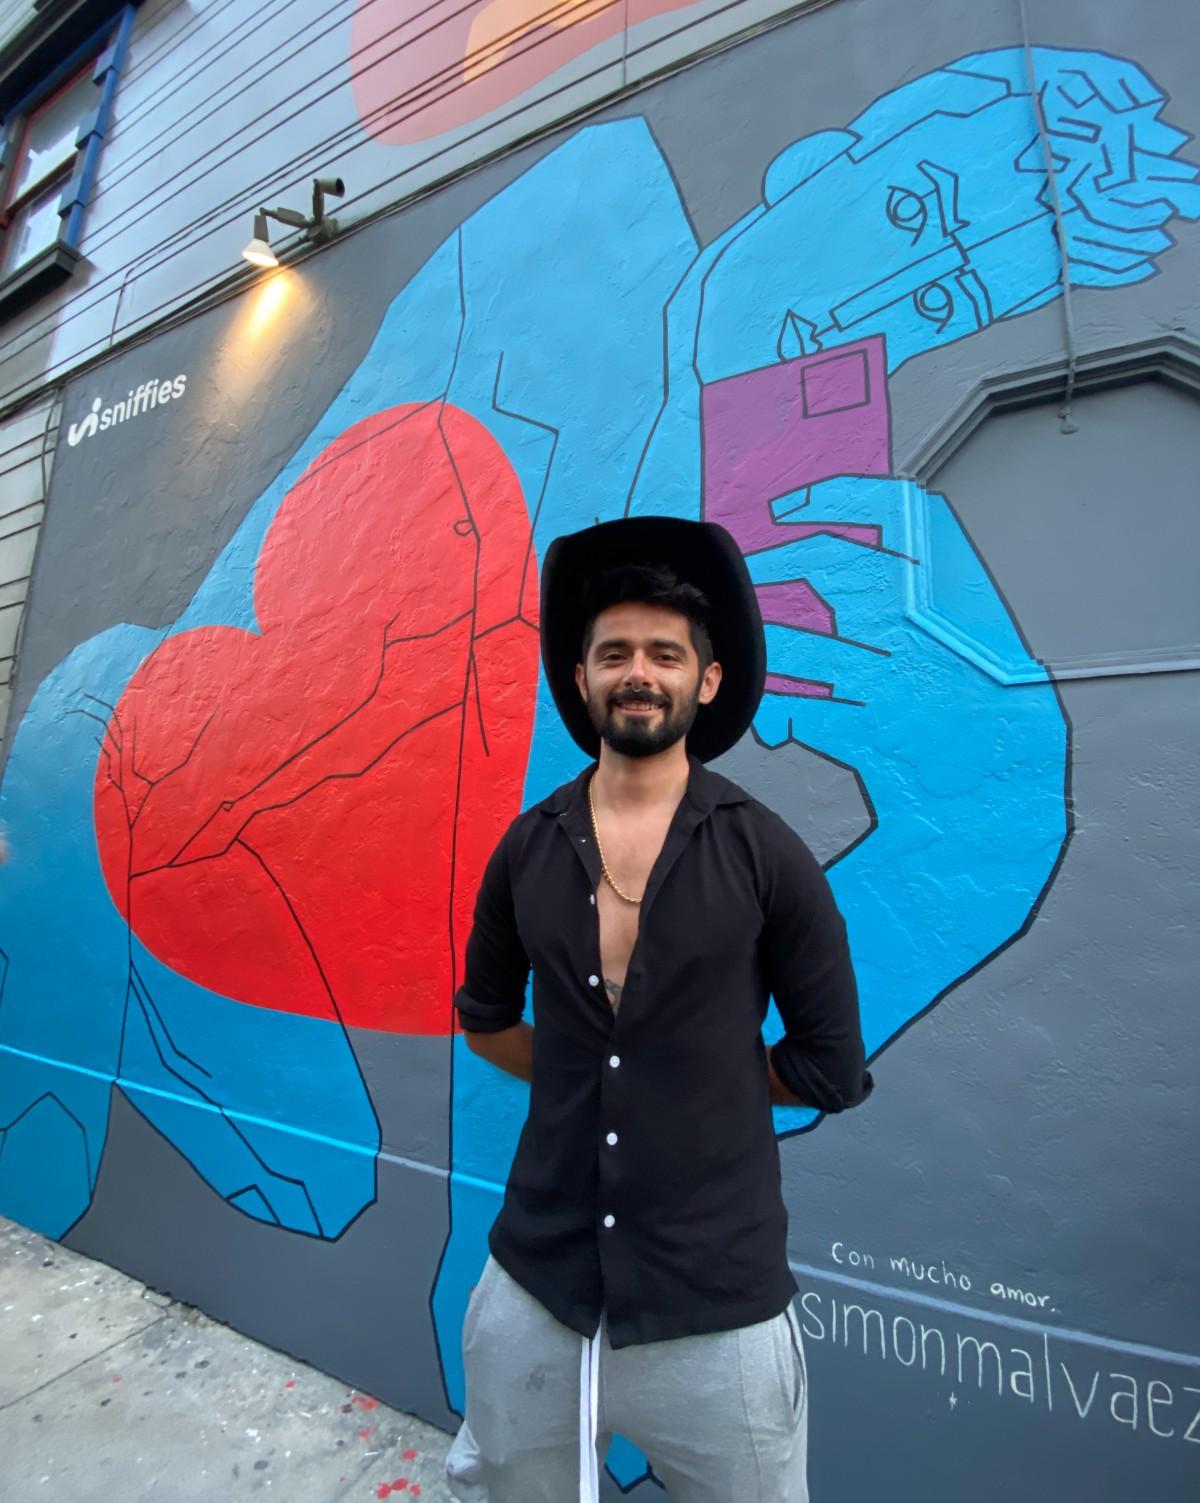 Simon Malvaez with his latest work in San Francisco